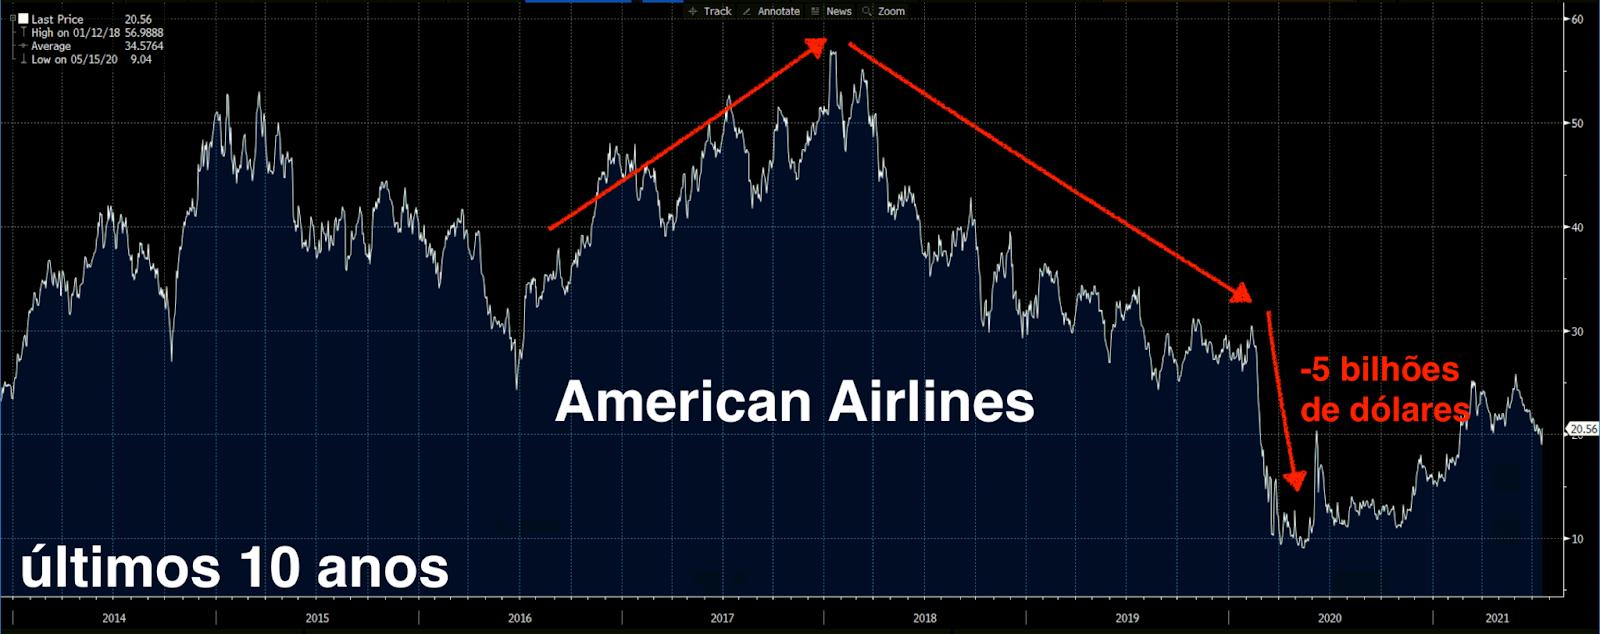 Desempenho de American Airlines nos últimos 10 anos.